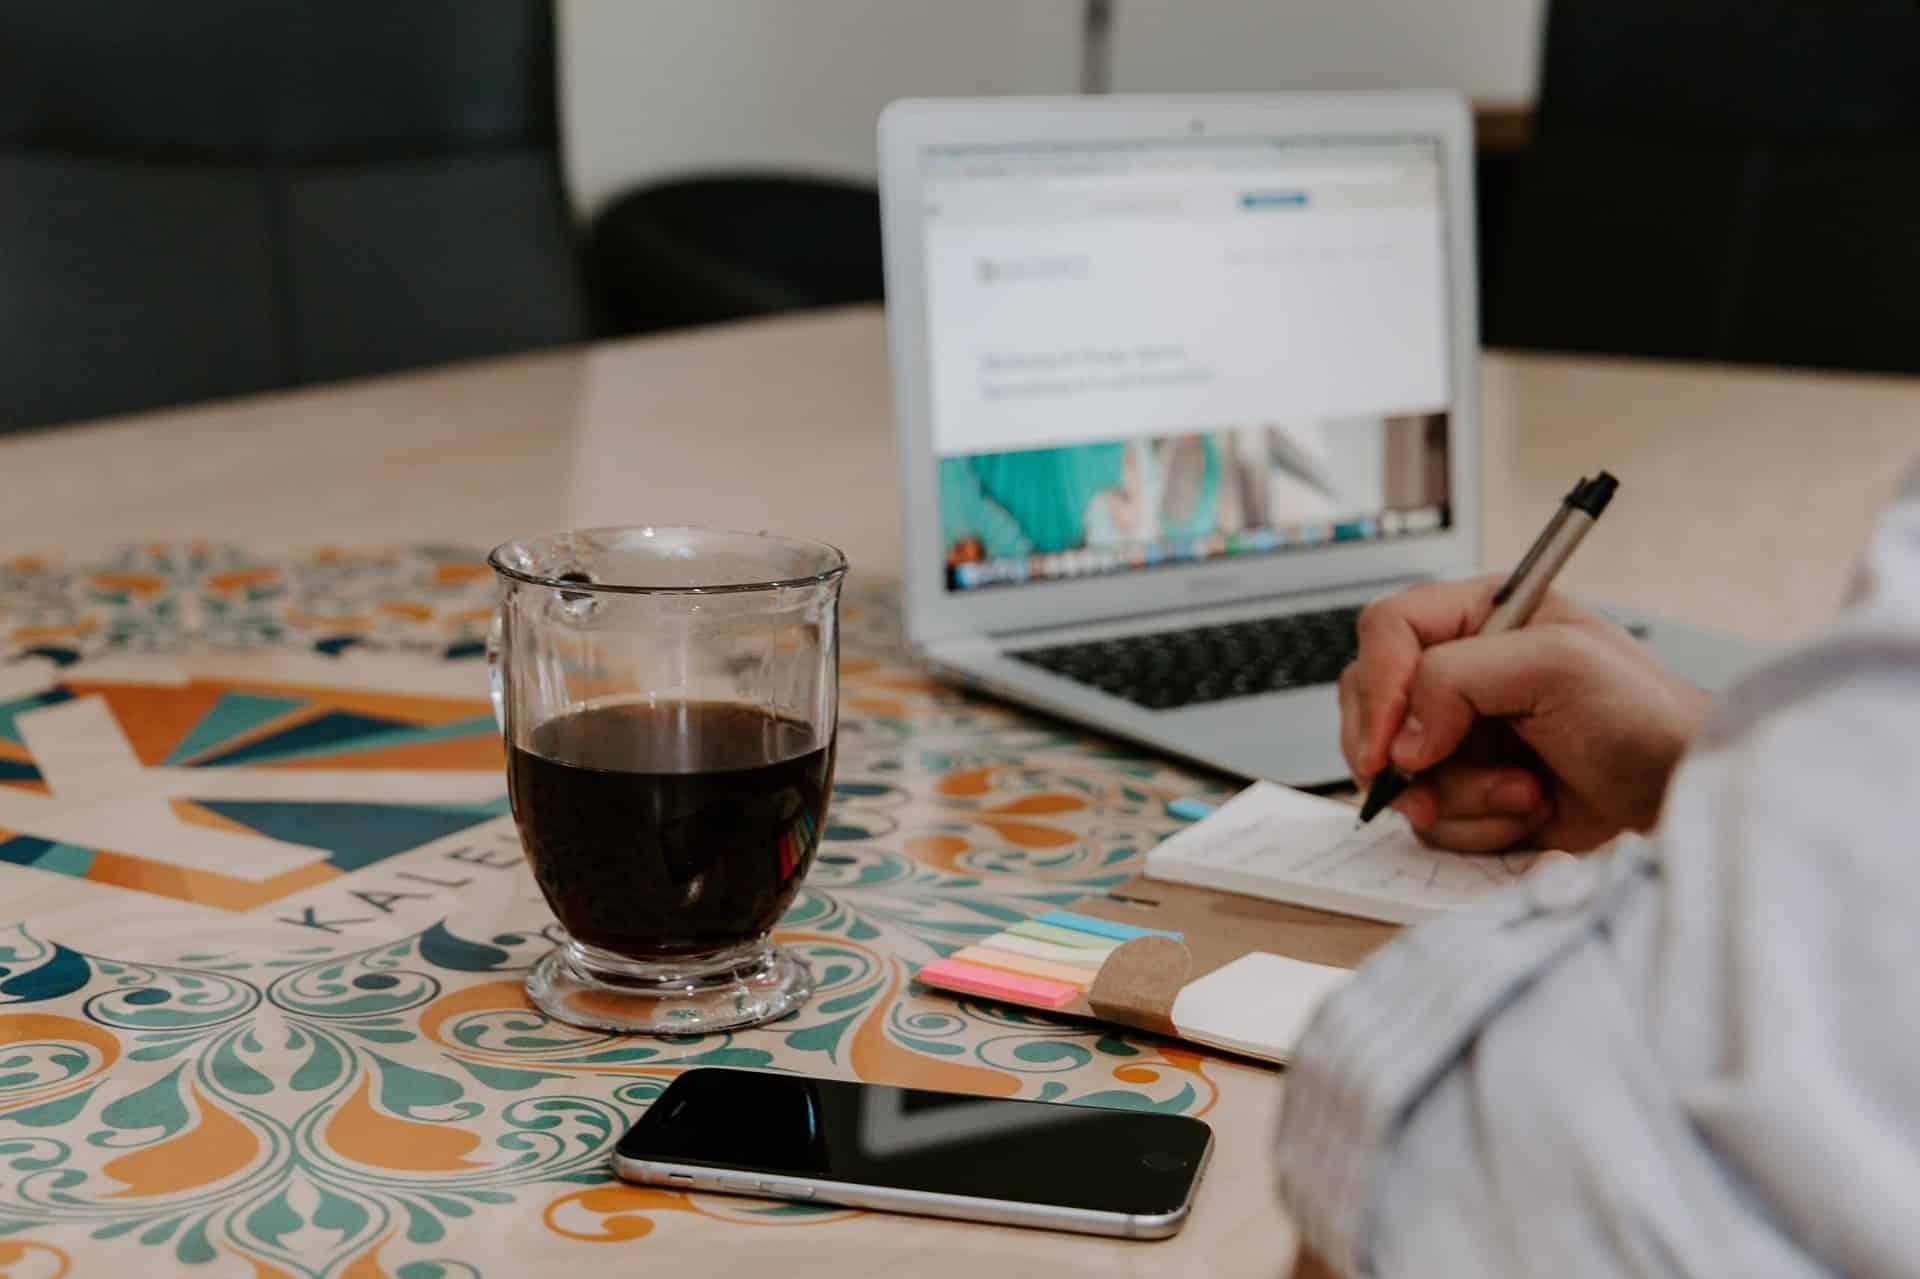 digital marketing brainstorming